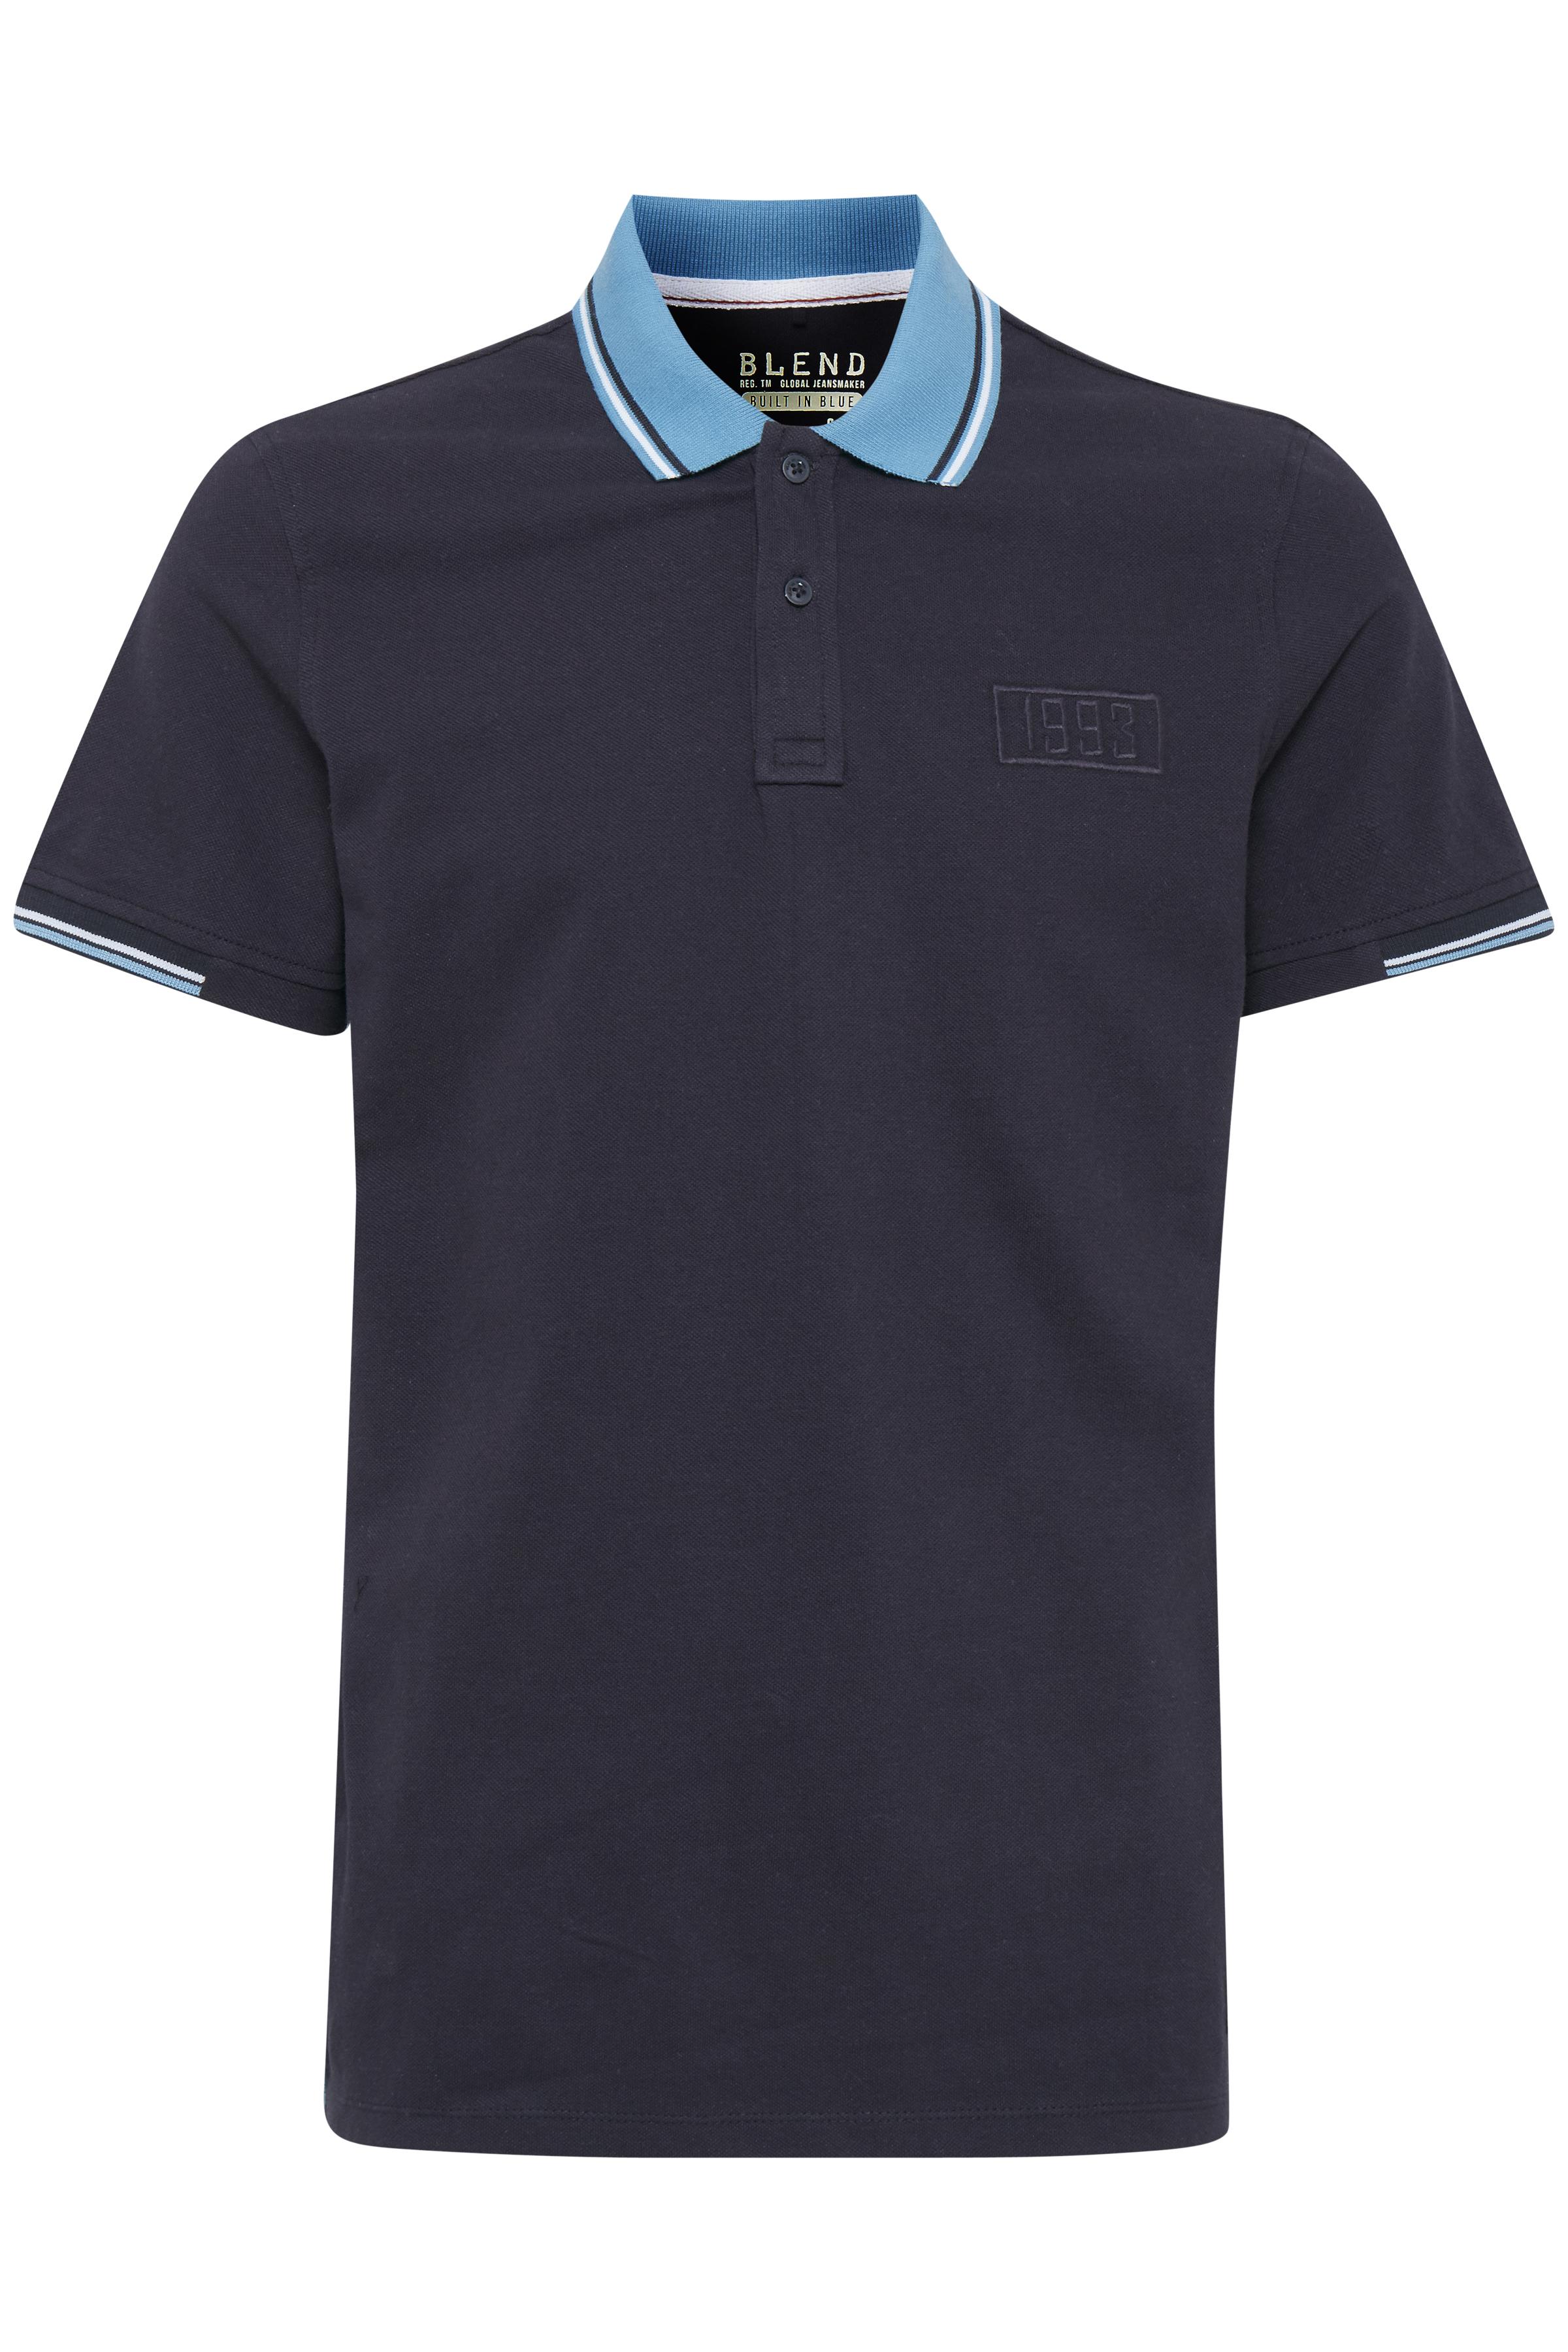 Image of Blend He Herre Kortærmet T-shirt - Dark Navy Blue